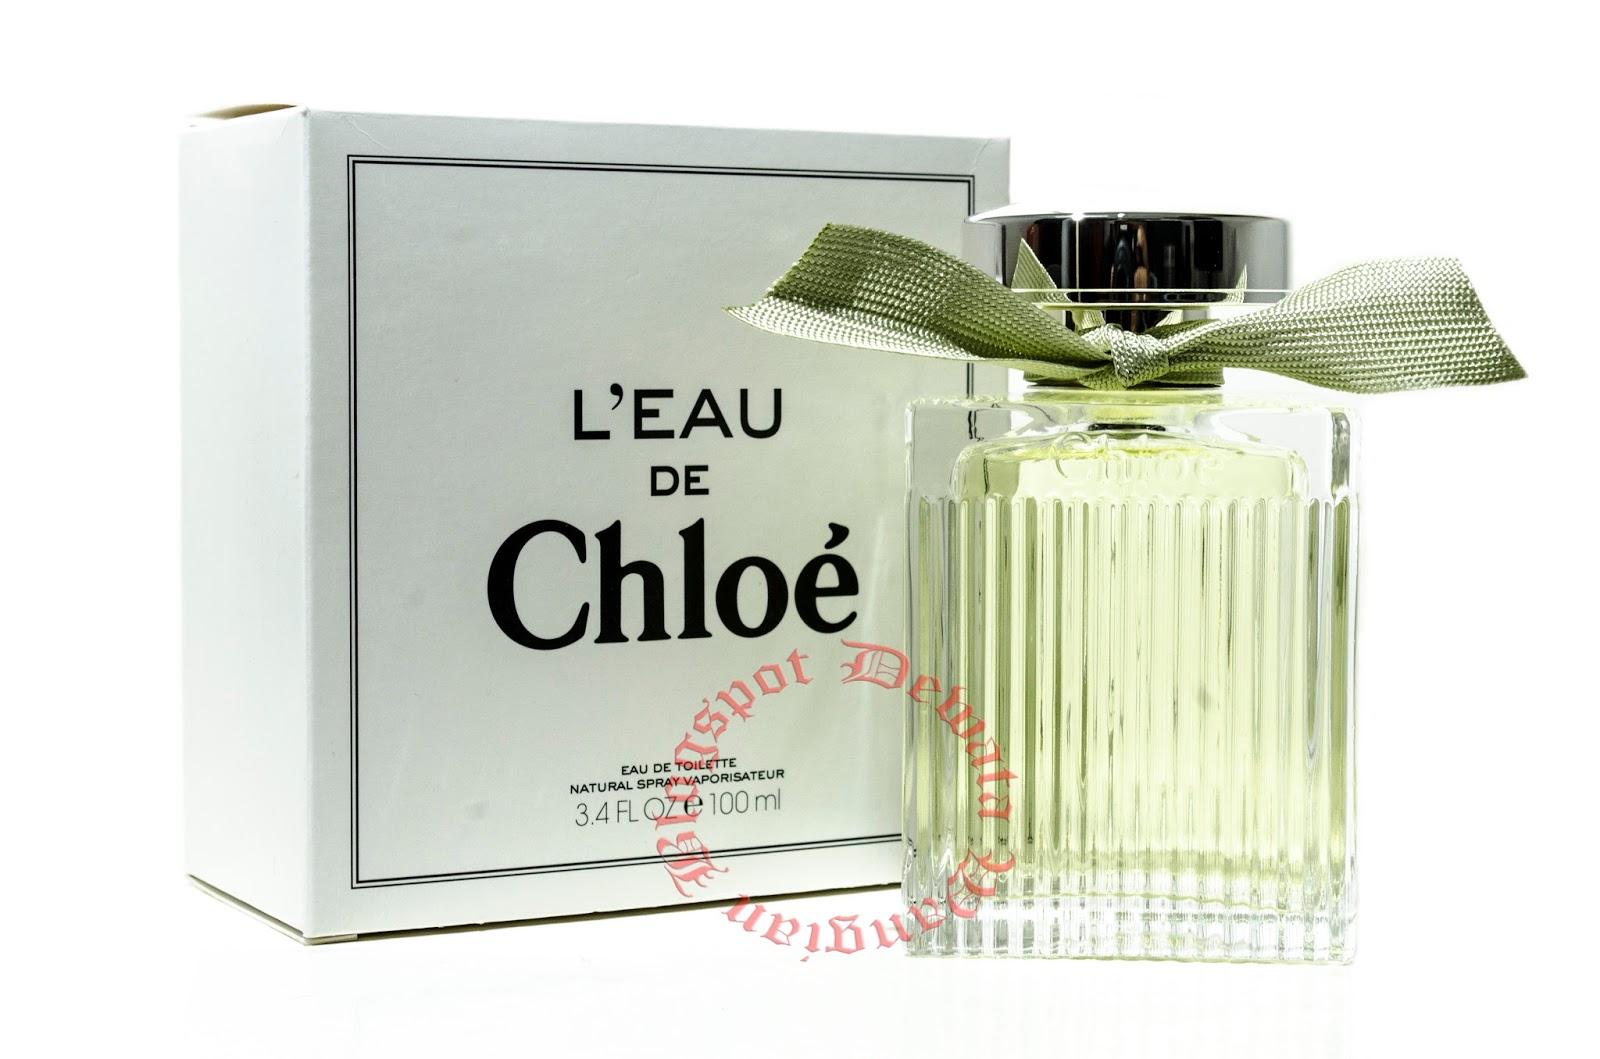 Cosmetic Wangian De Original Chloé perfumeamp; TerbaikL'eau Tester pLqMVGUzS